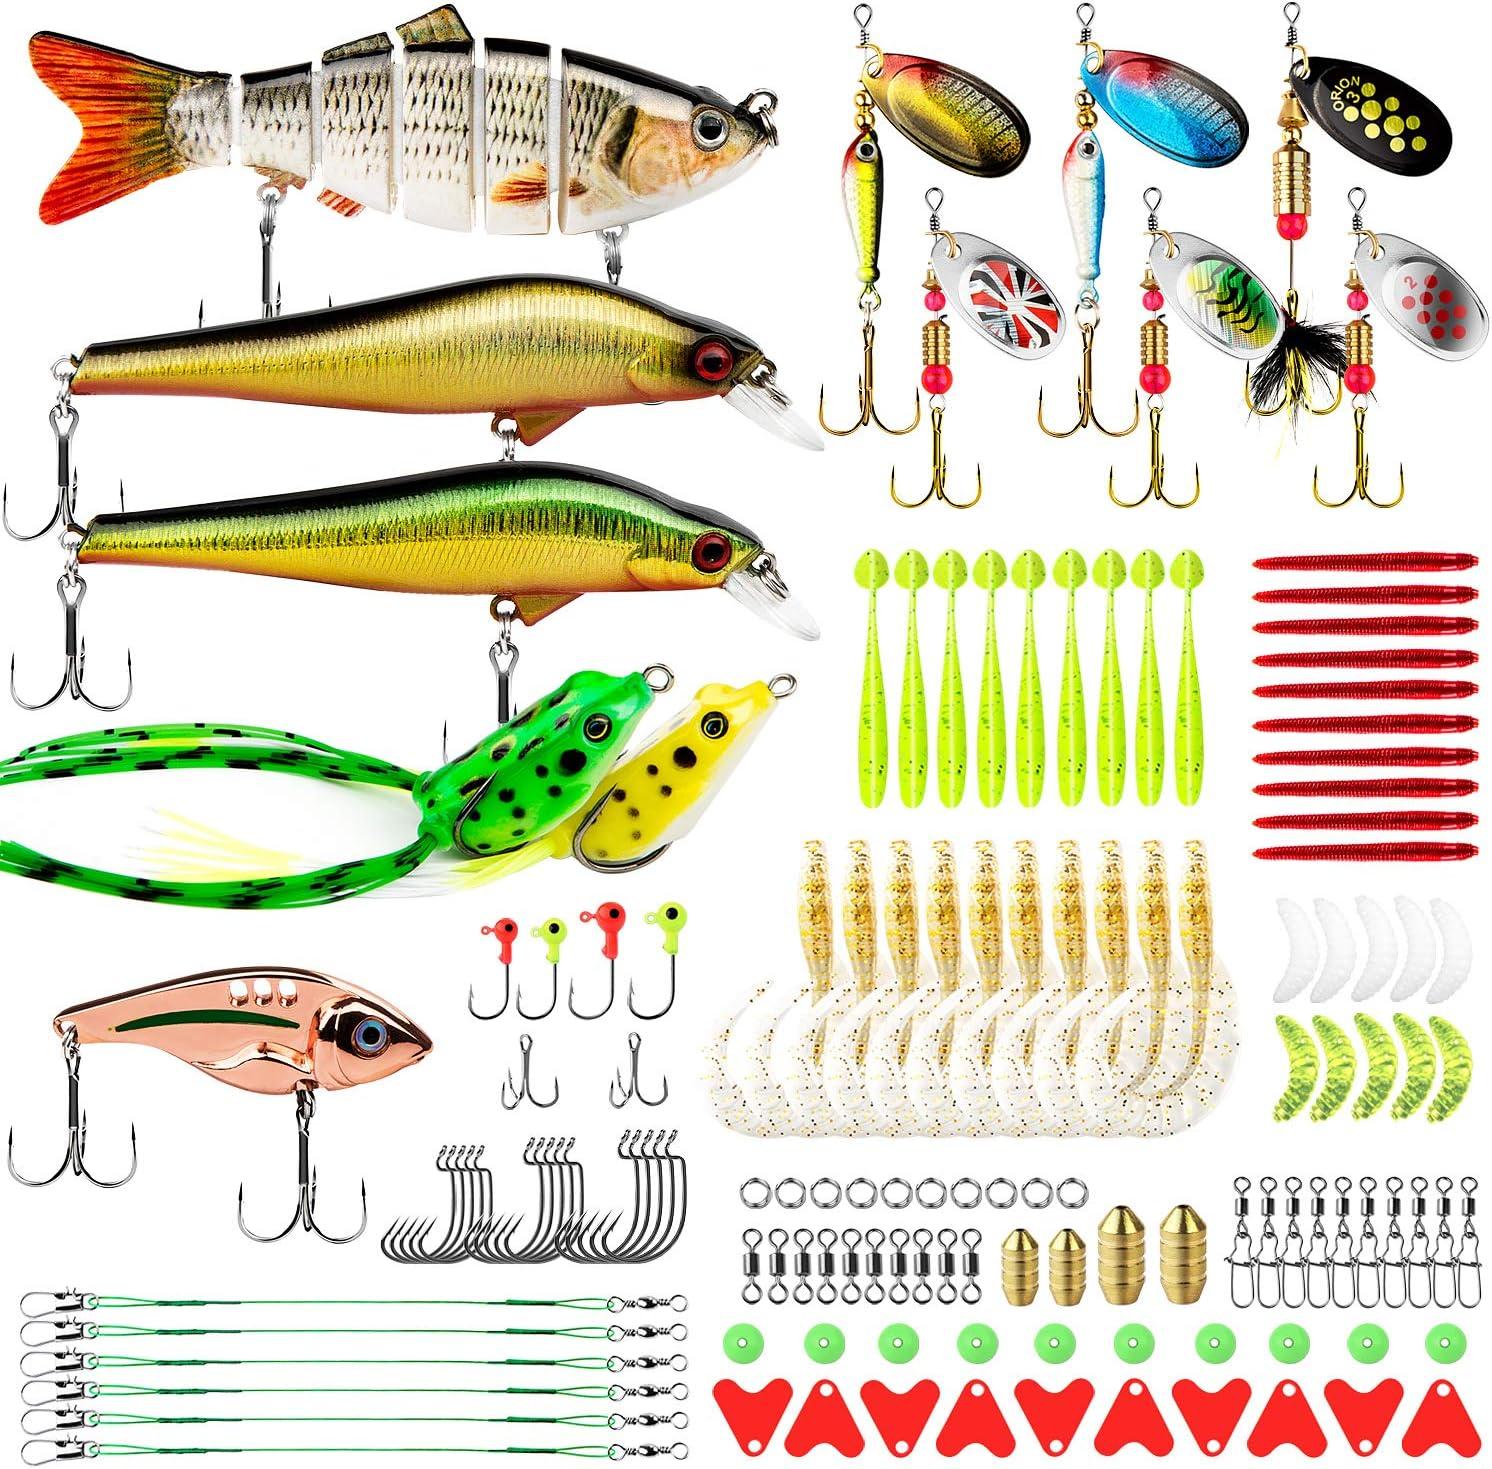 Multi Jointed Fishing Lures Sinking Wobbler Swimbait Bait Hard Y8X9